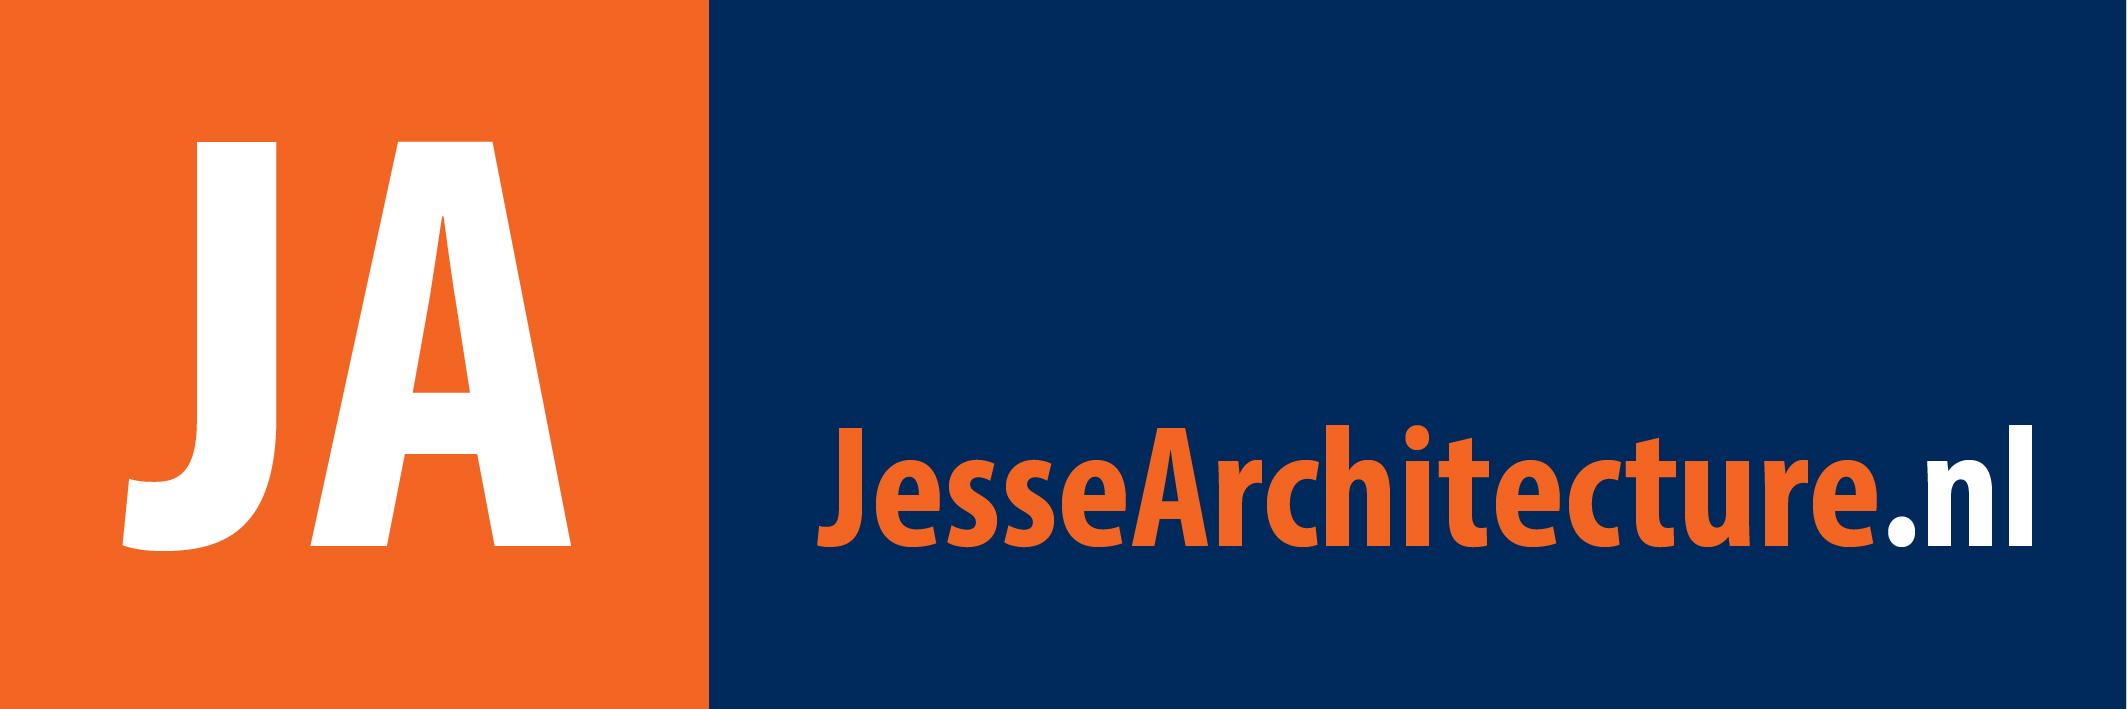 Logo JesseArchitecture